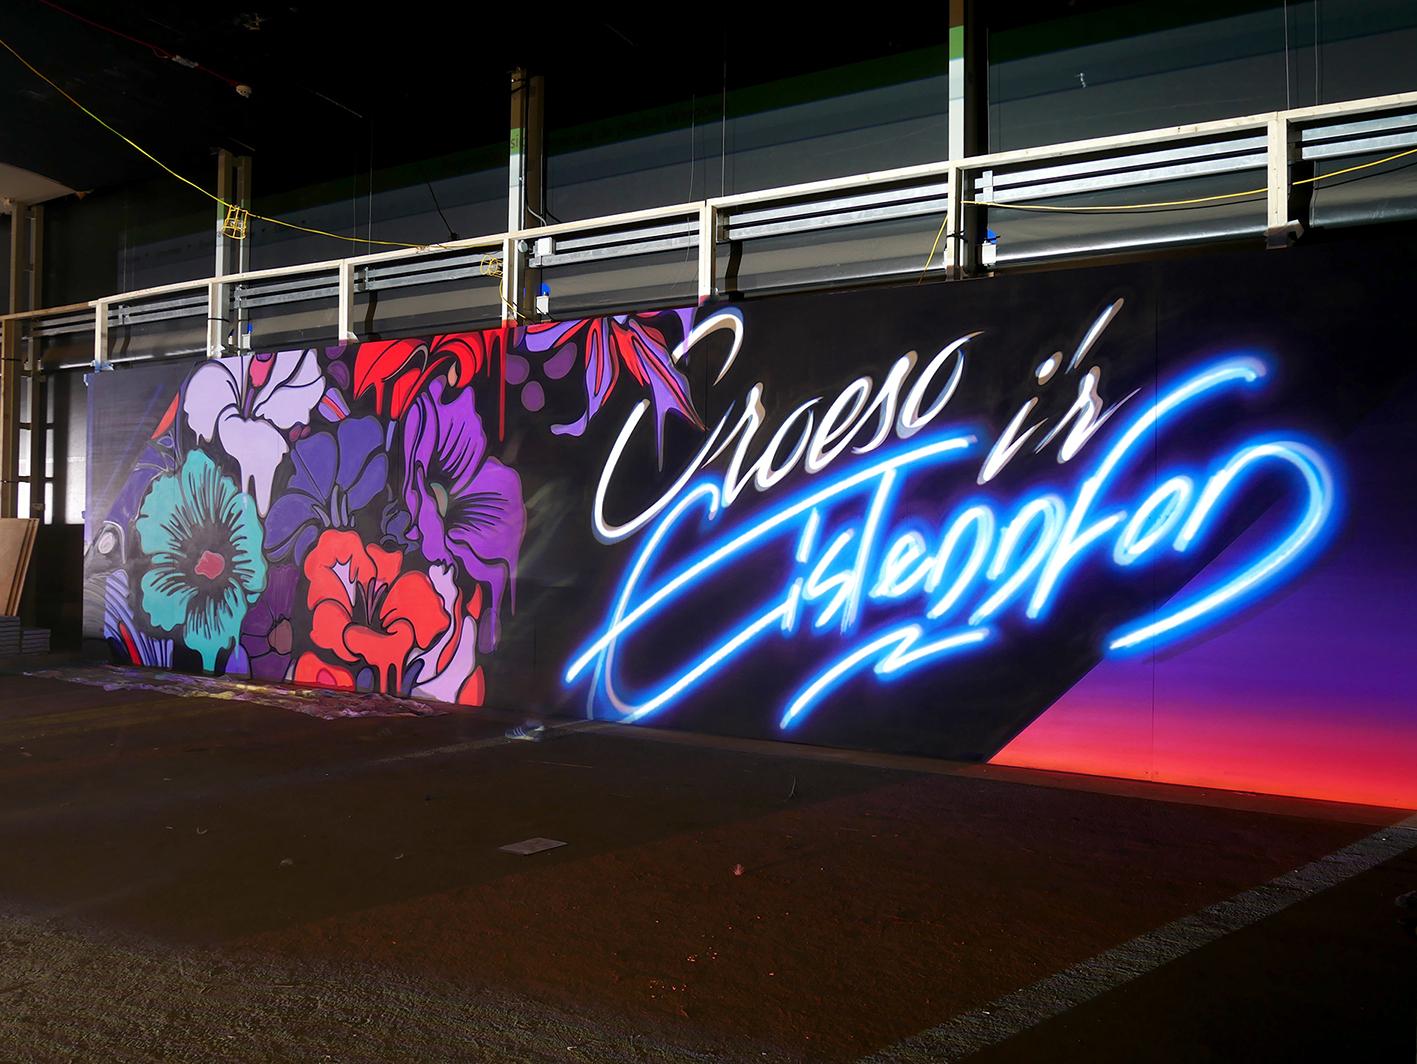 Nerone-street-art-Cardif-neone 15